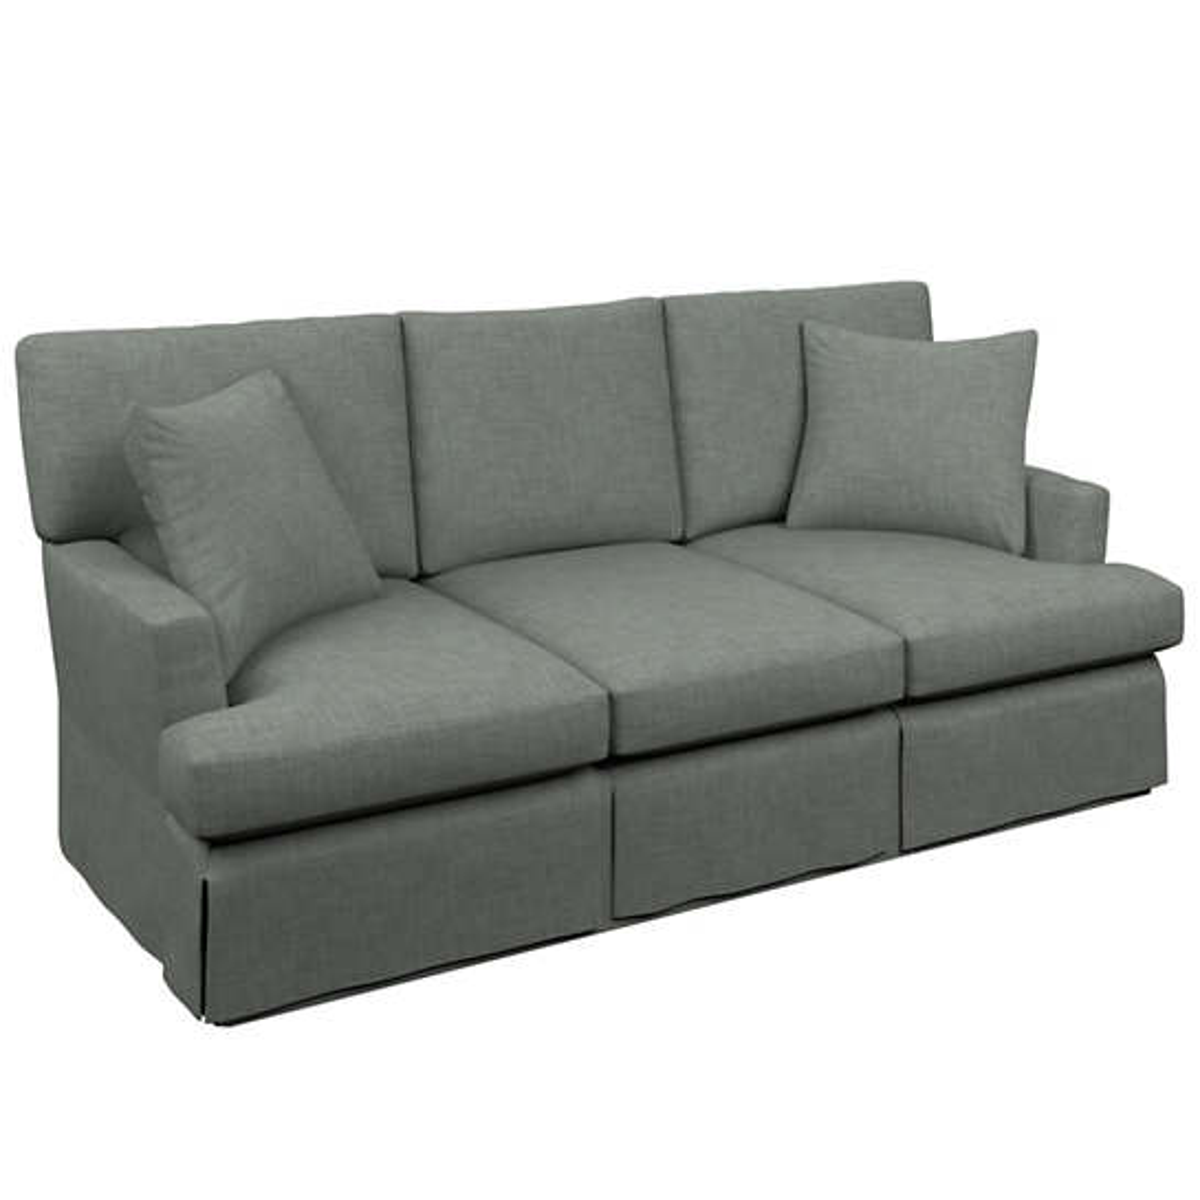 Canvasuede Ocean Saybrook 3 Seater Upholstered Sofa